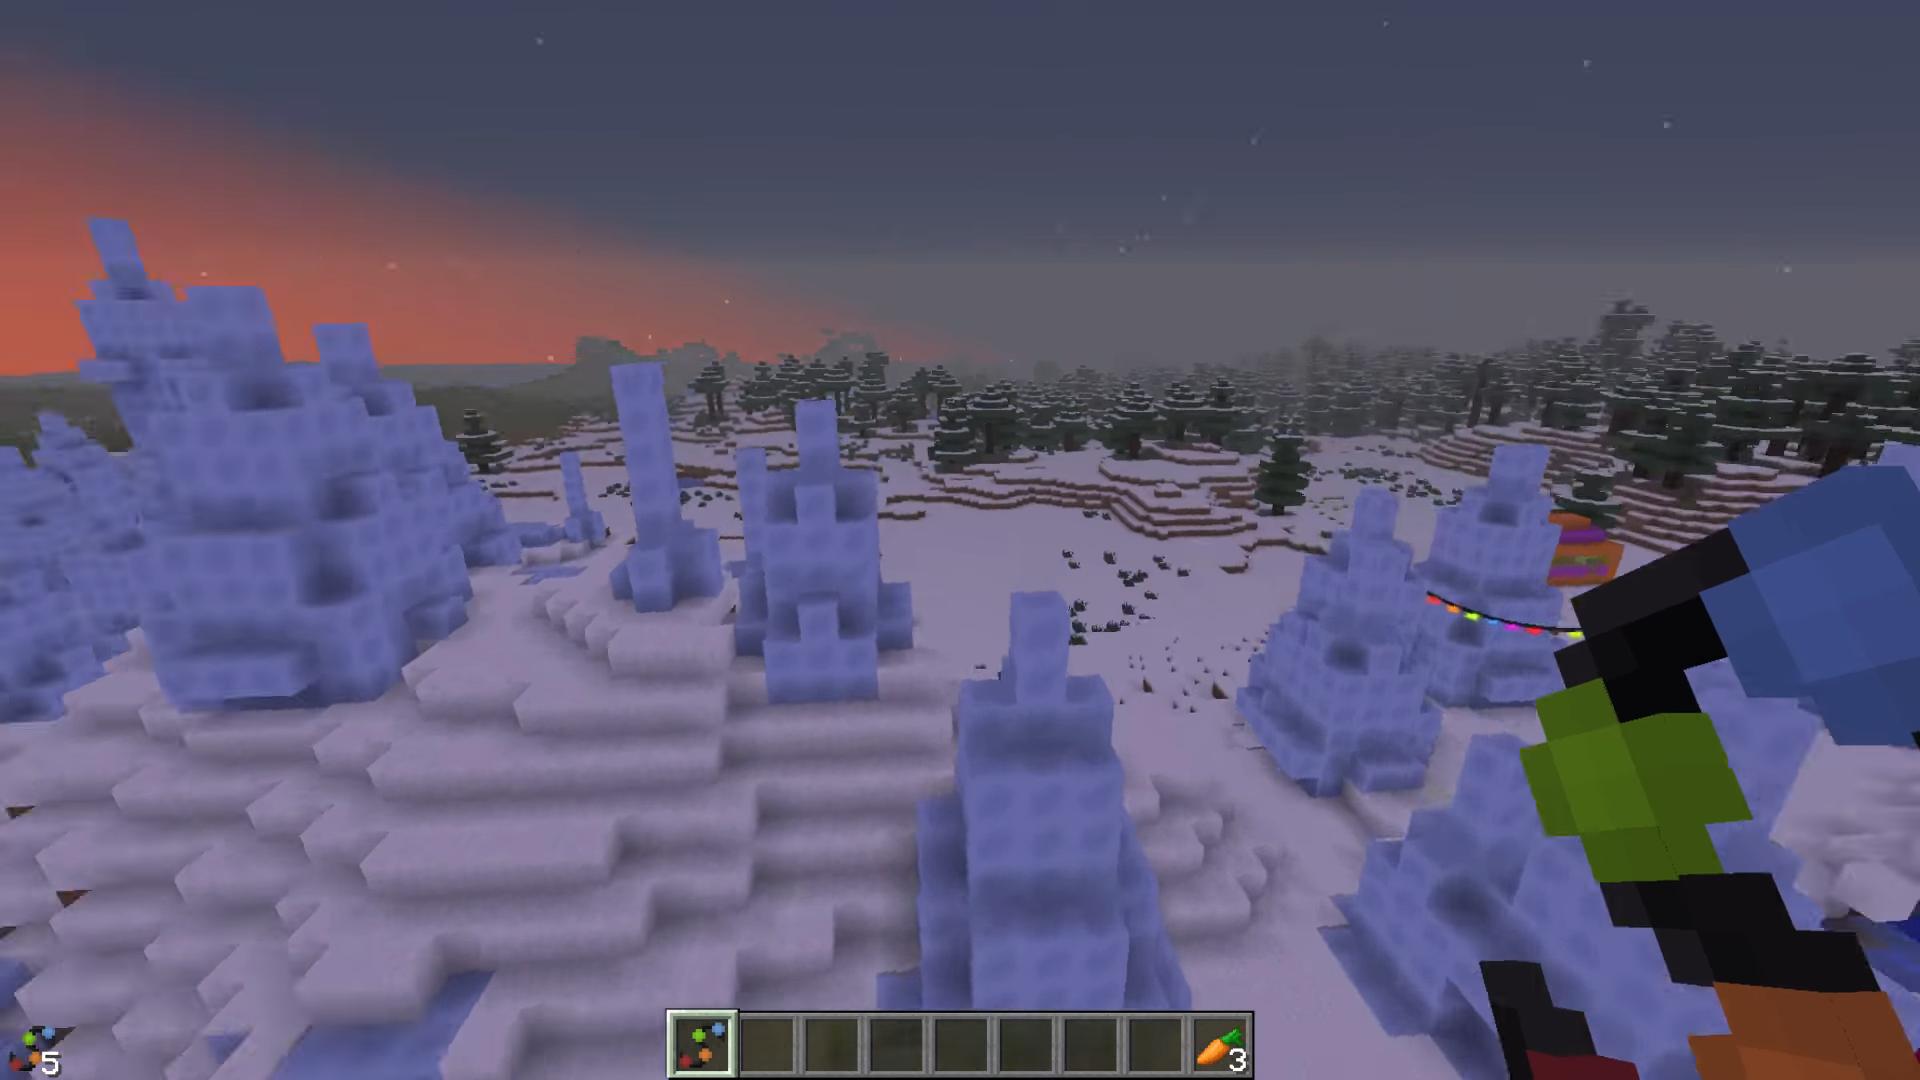 Мод «Fairy Lights» (Новогодние гирлянды) - скриншот 4